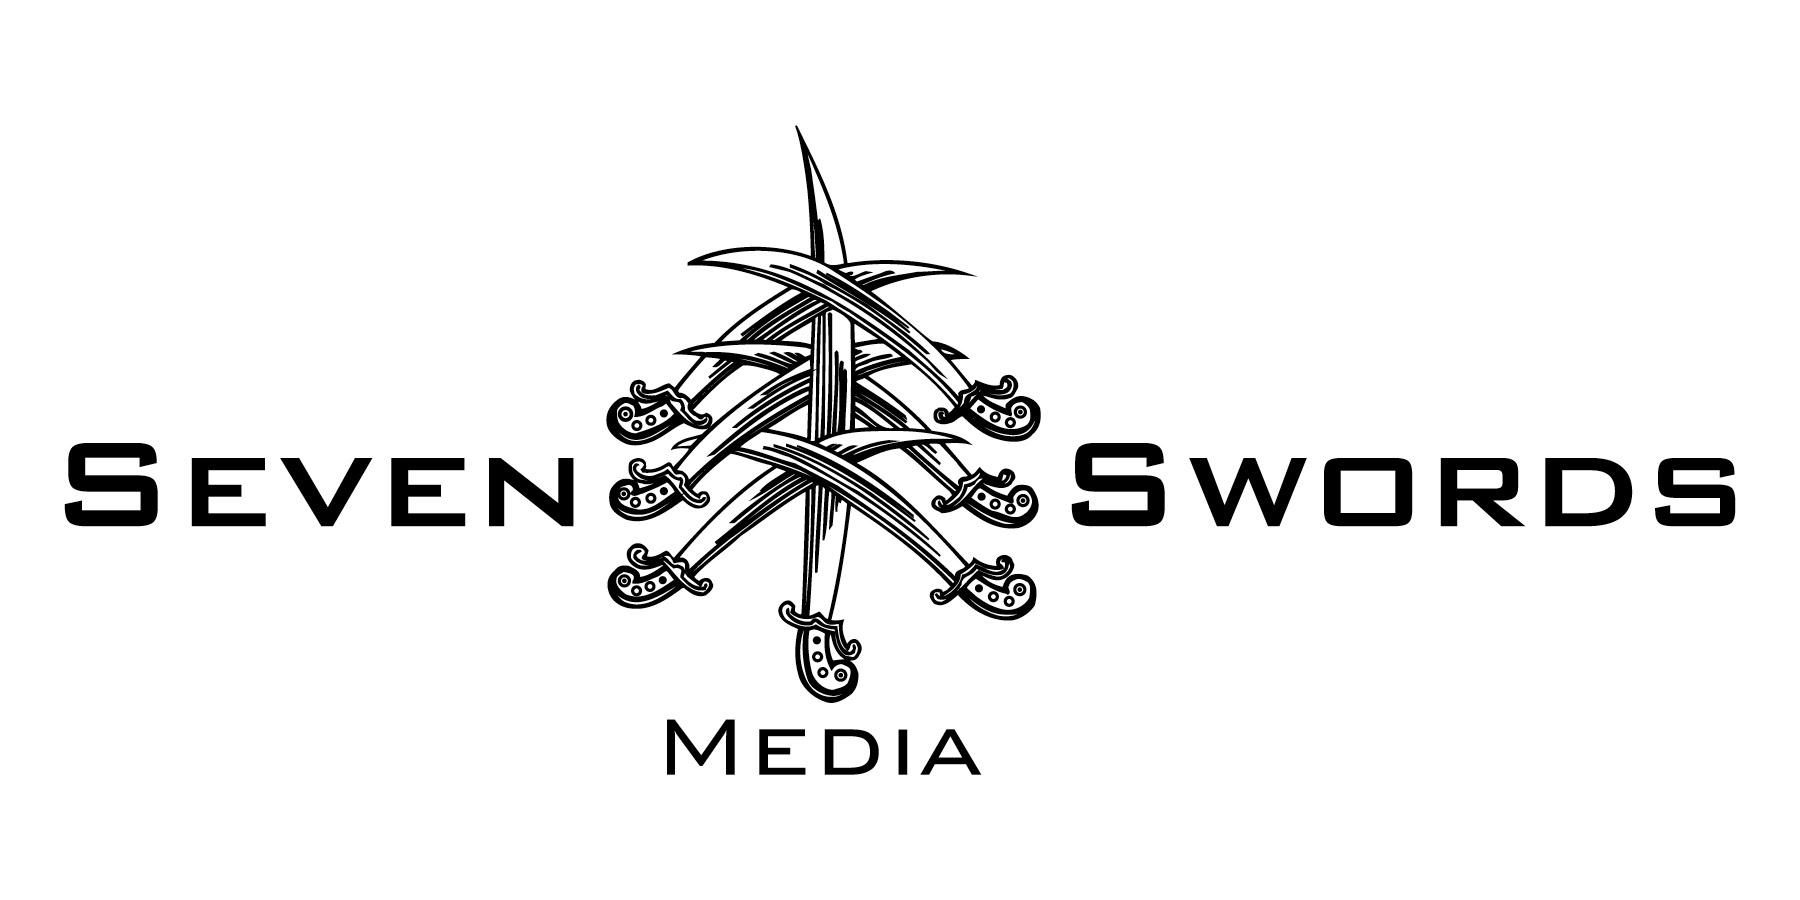 Seven Swords Media